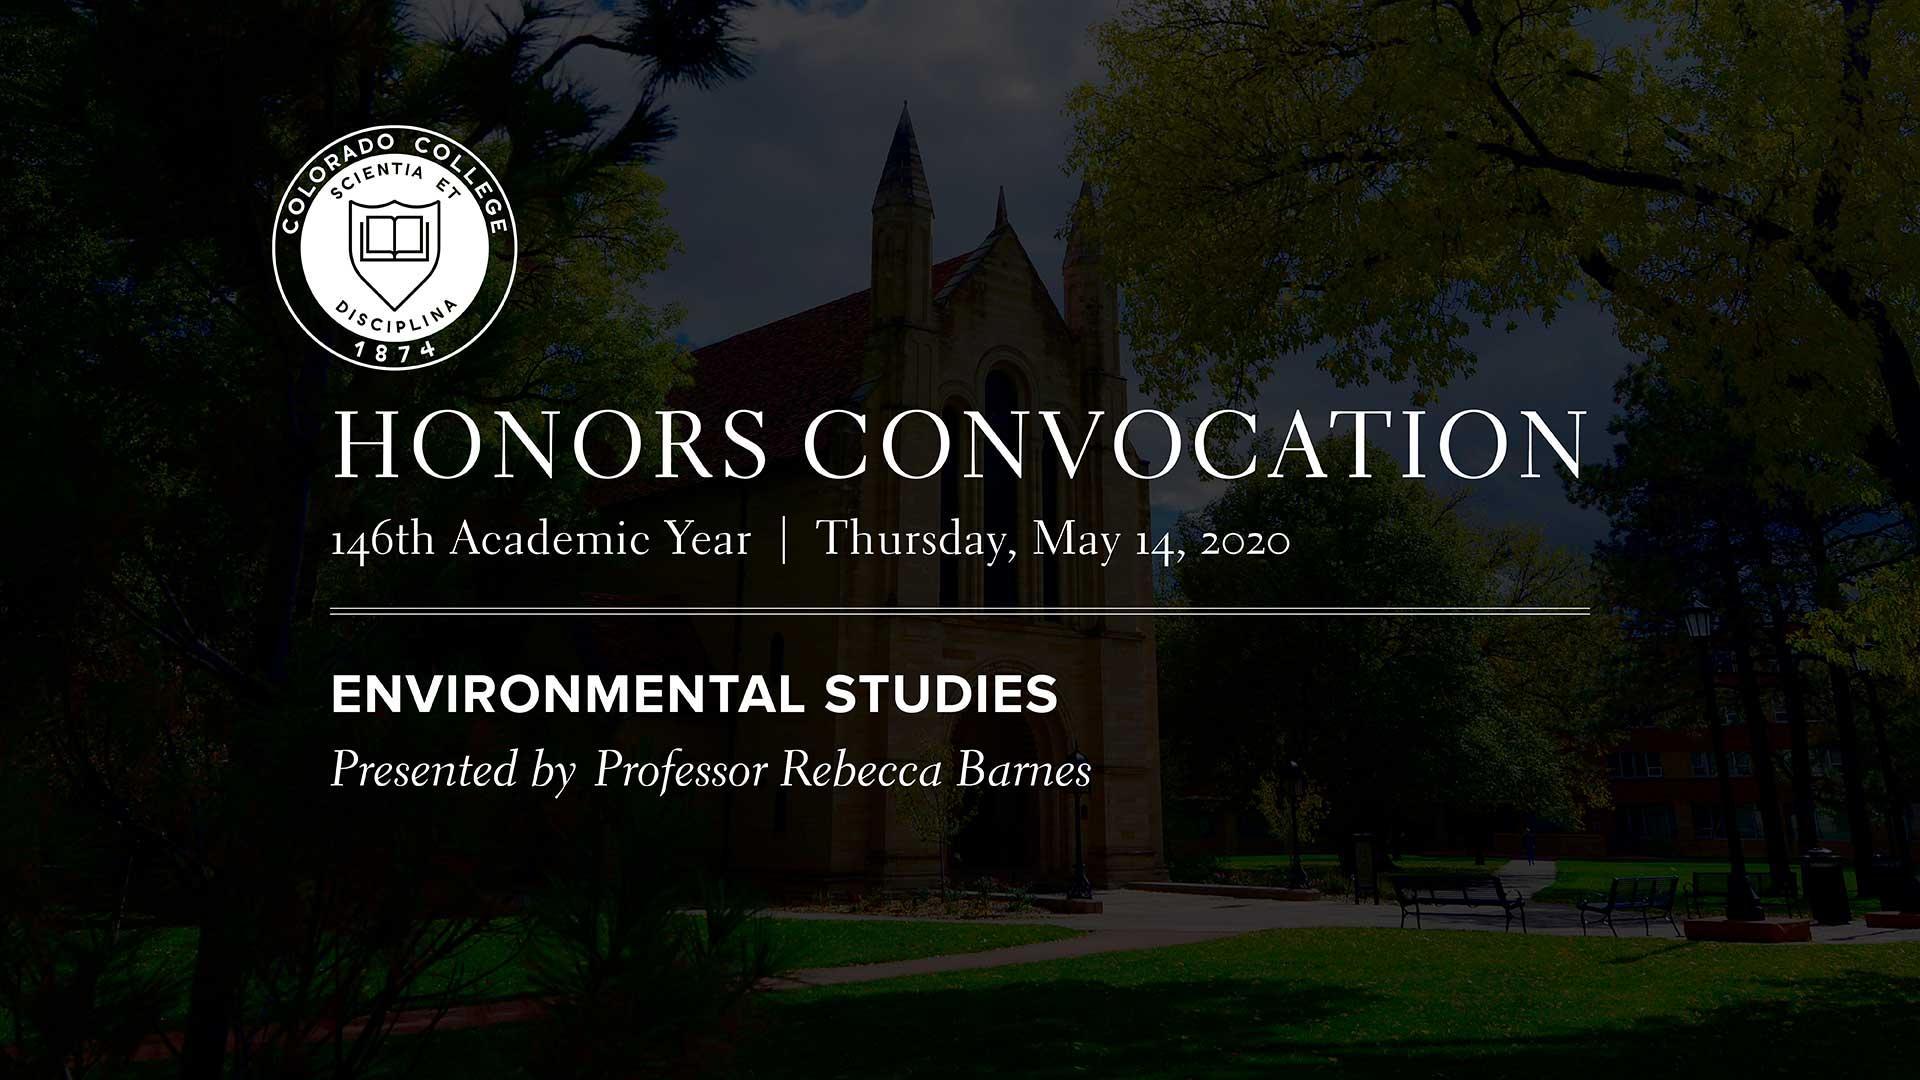 environmental studies video thumbnail